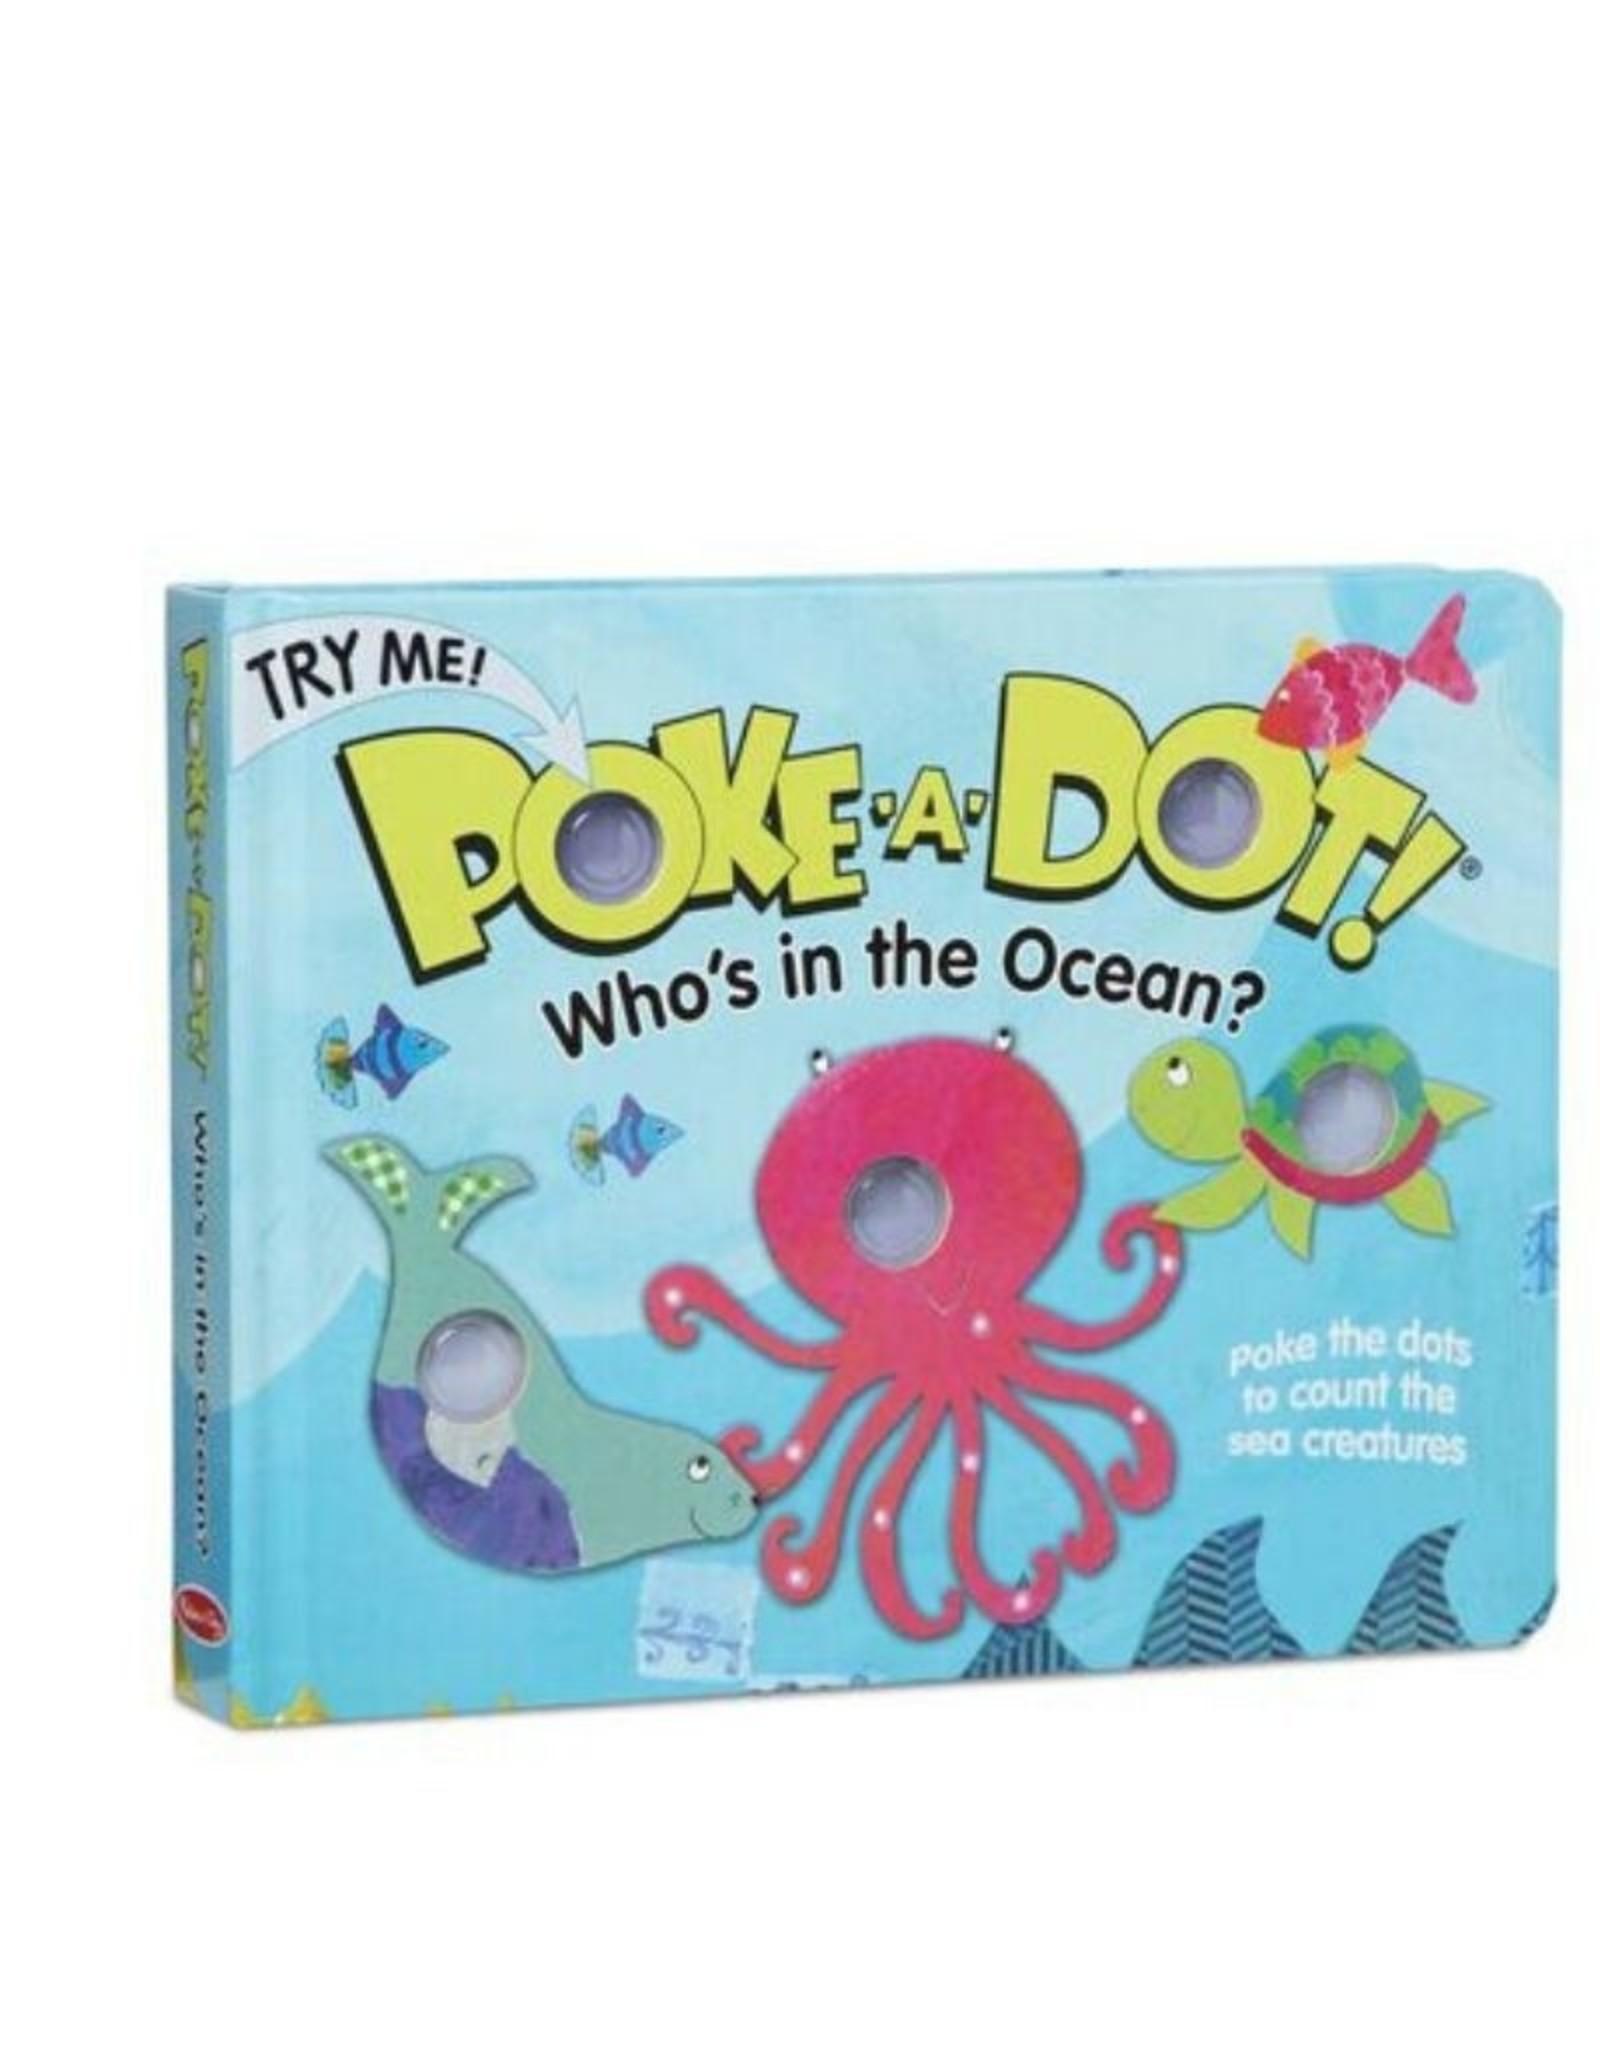 Melissa & Doug Poke-A-Dot! - Who's in the Ocean?